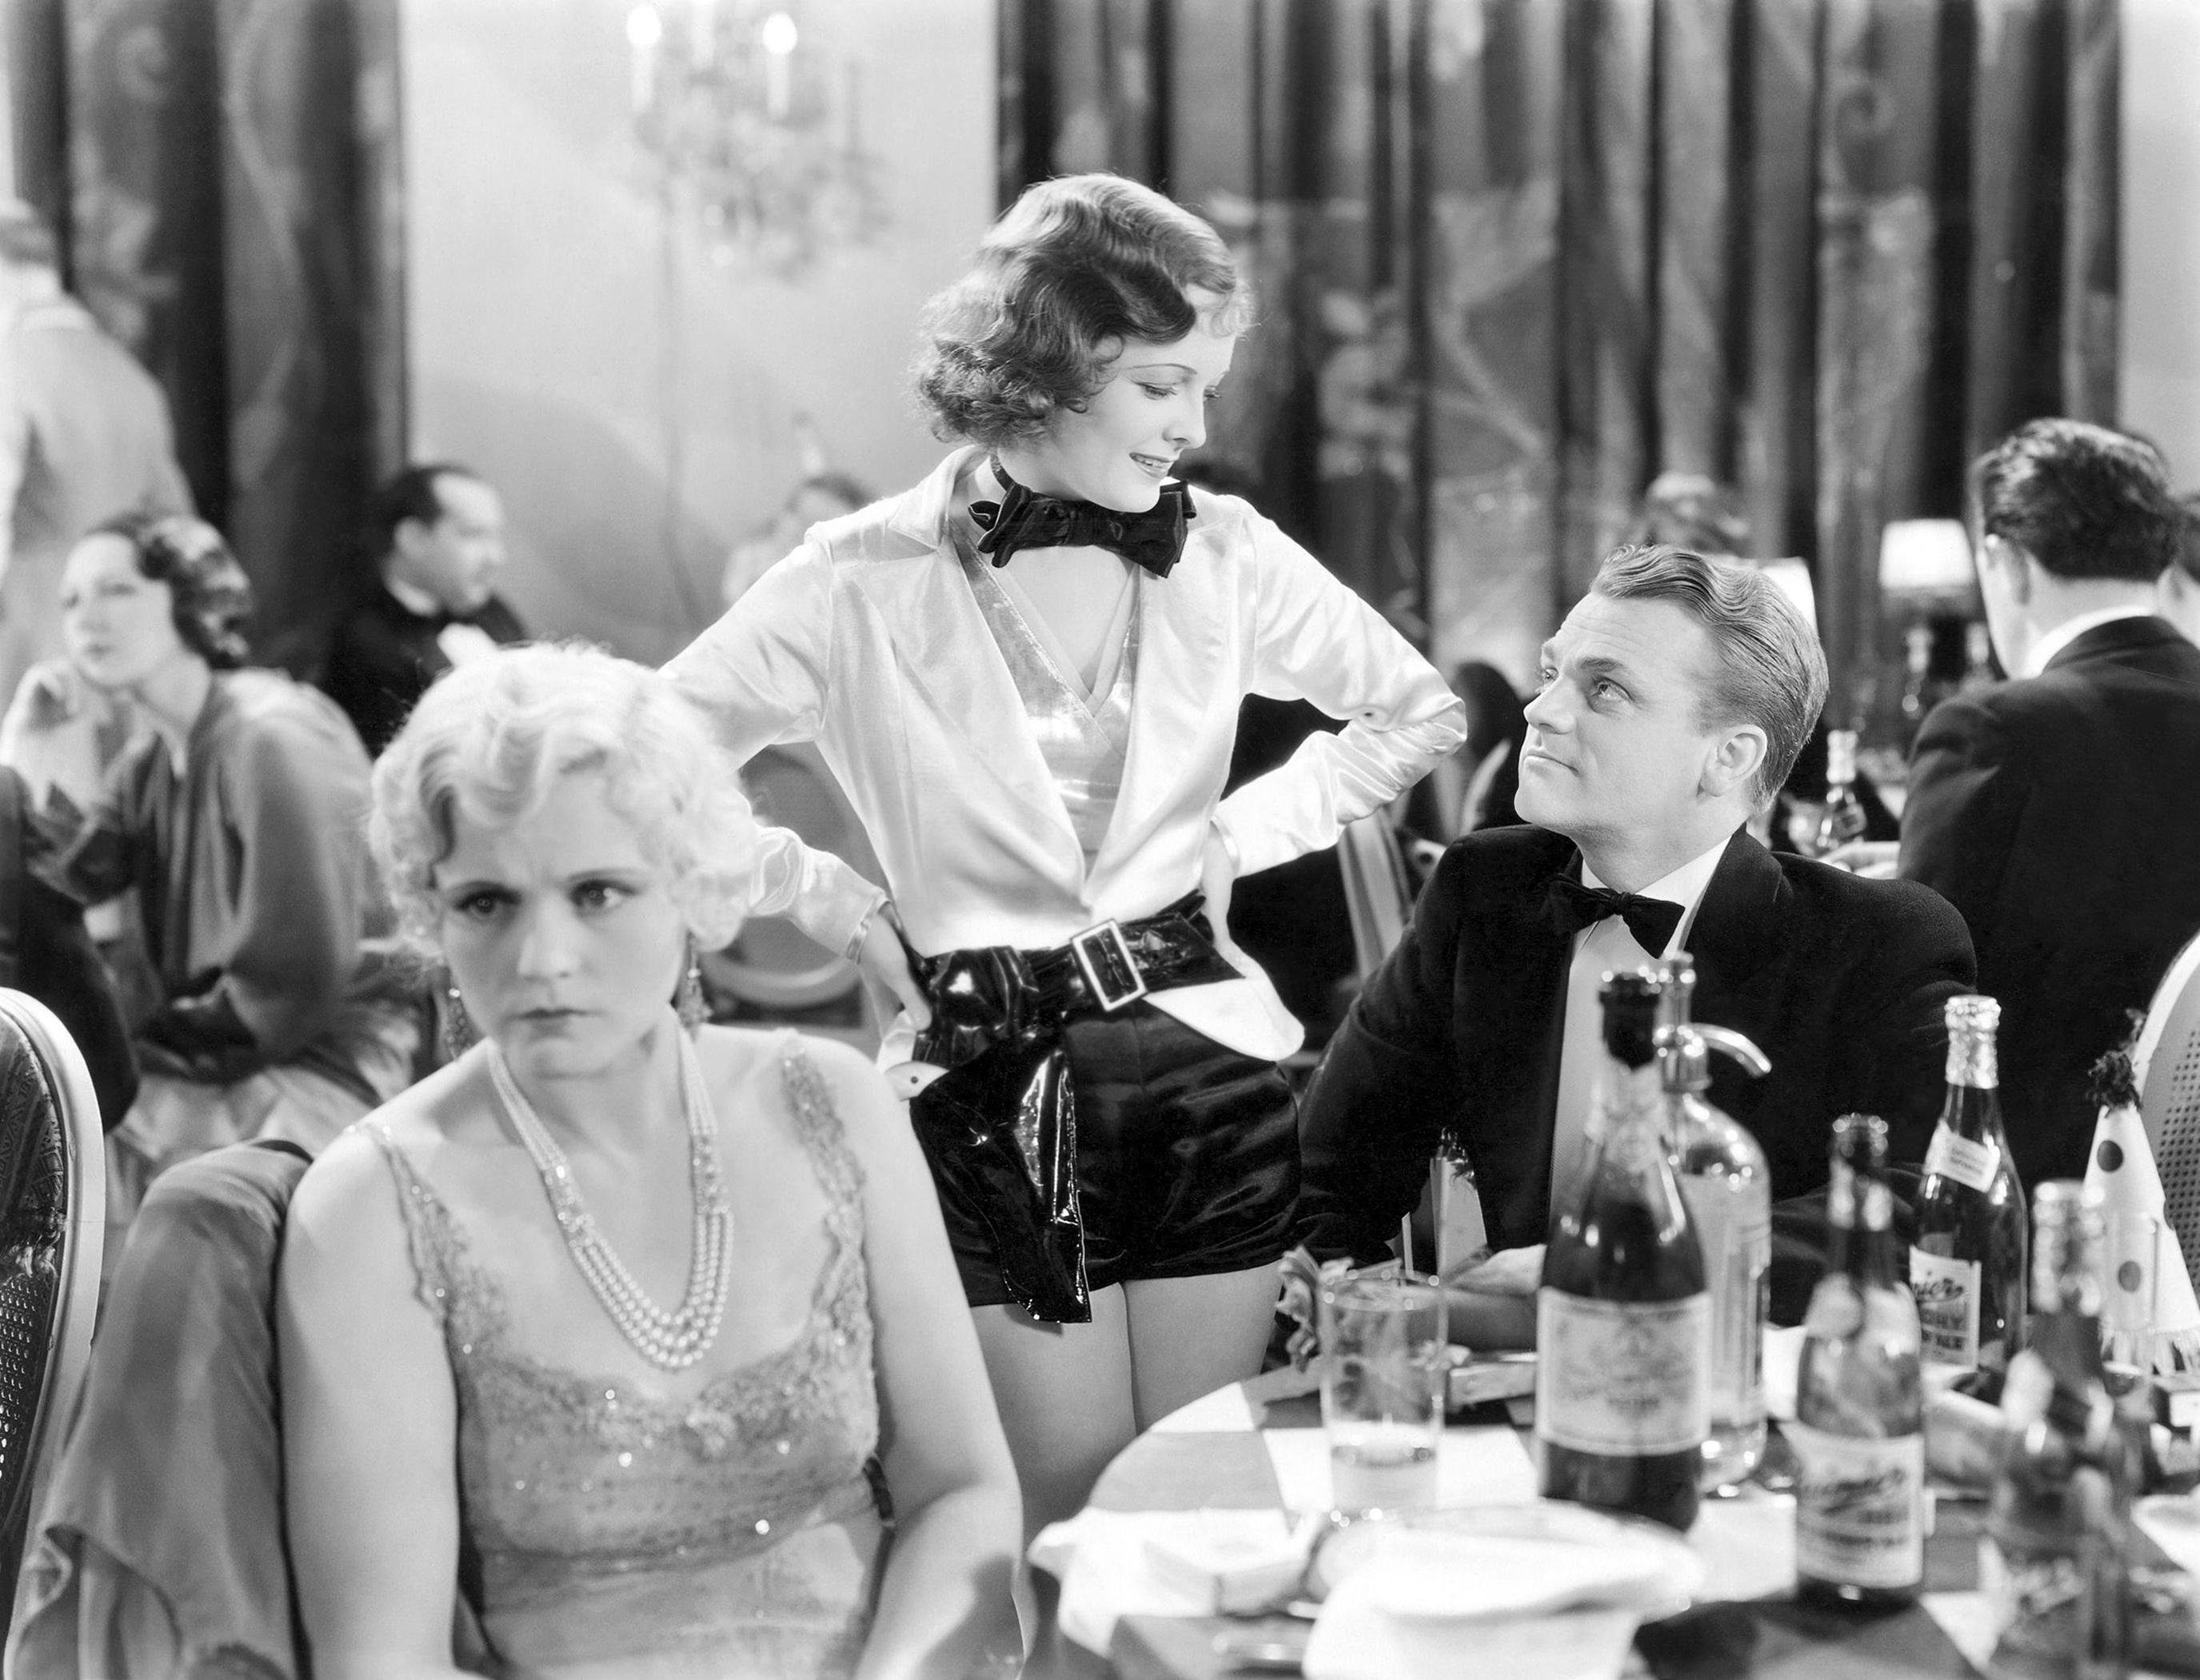 James Cagney & Virginia Bruce Publicity still from